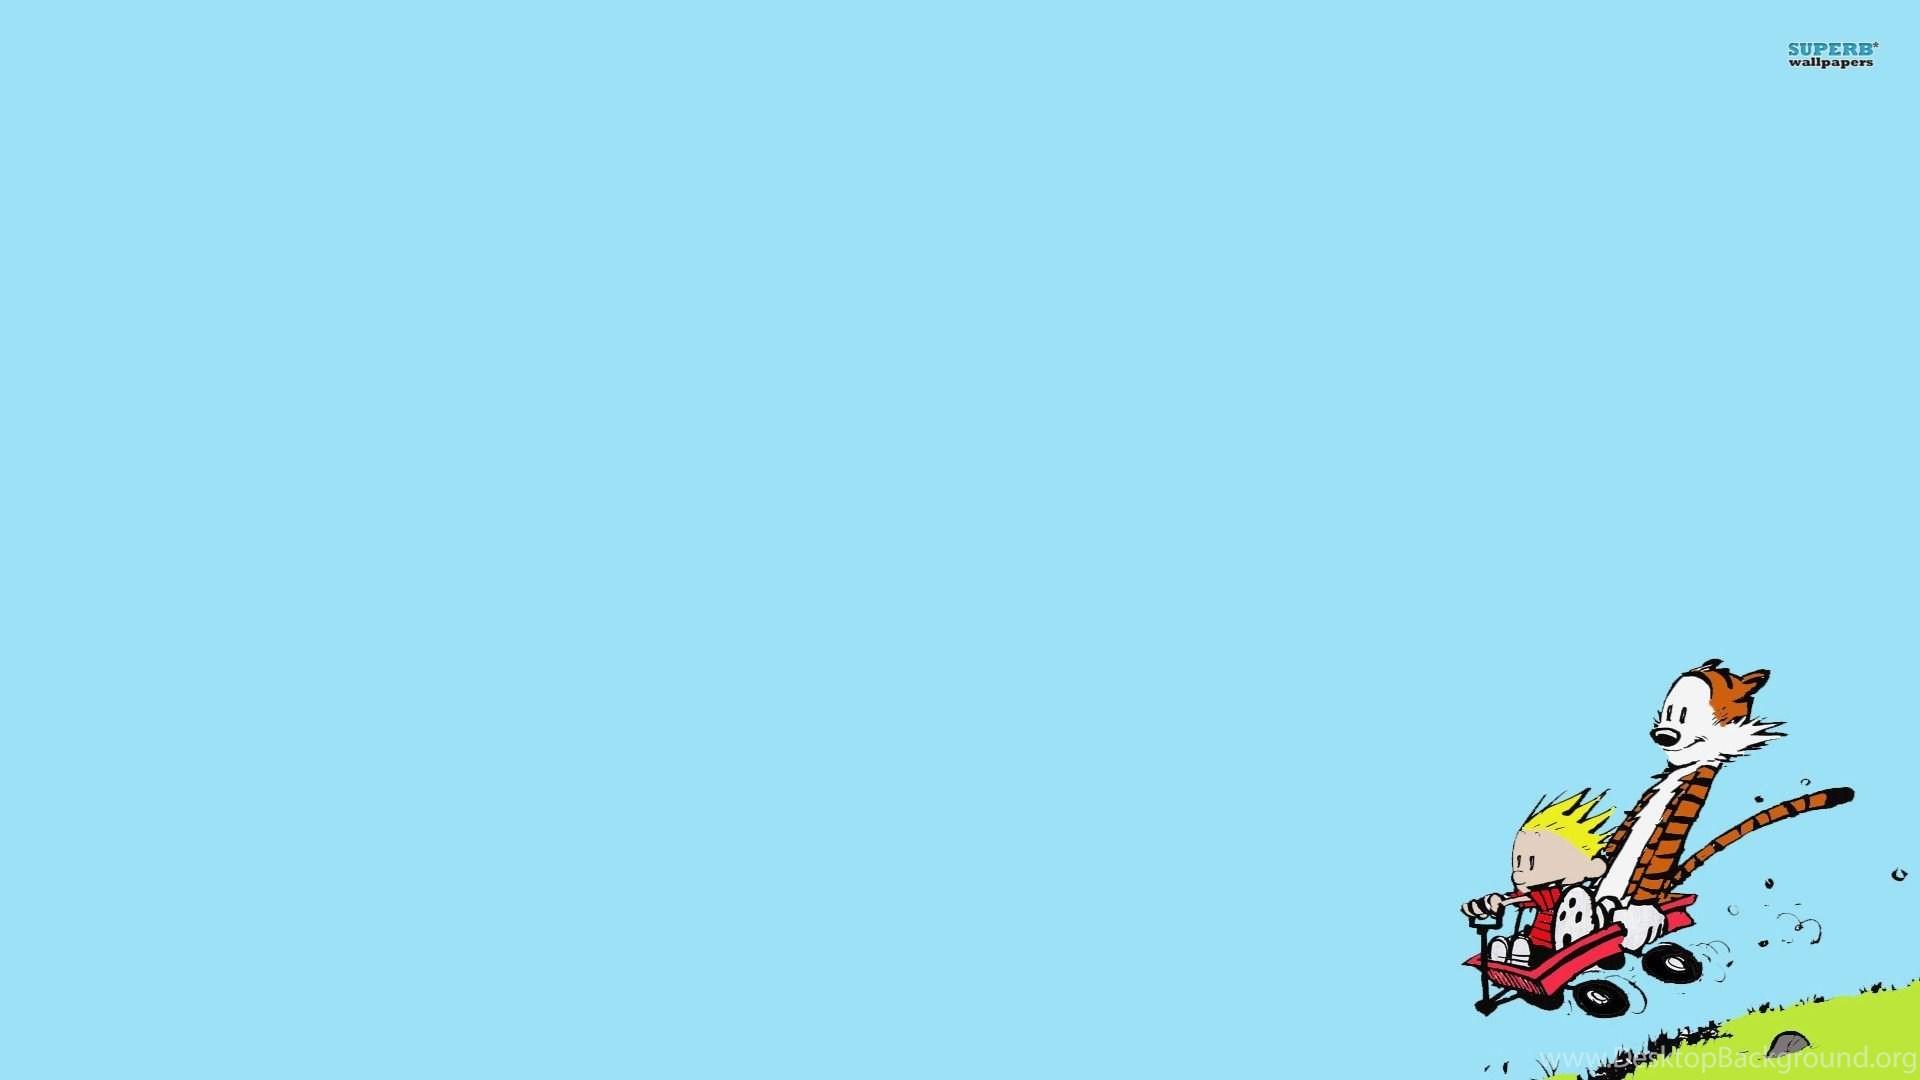 Calvin And Hobbes Wallpapers Cartoon Wallpapers Desktop Background